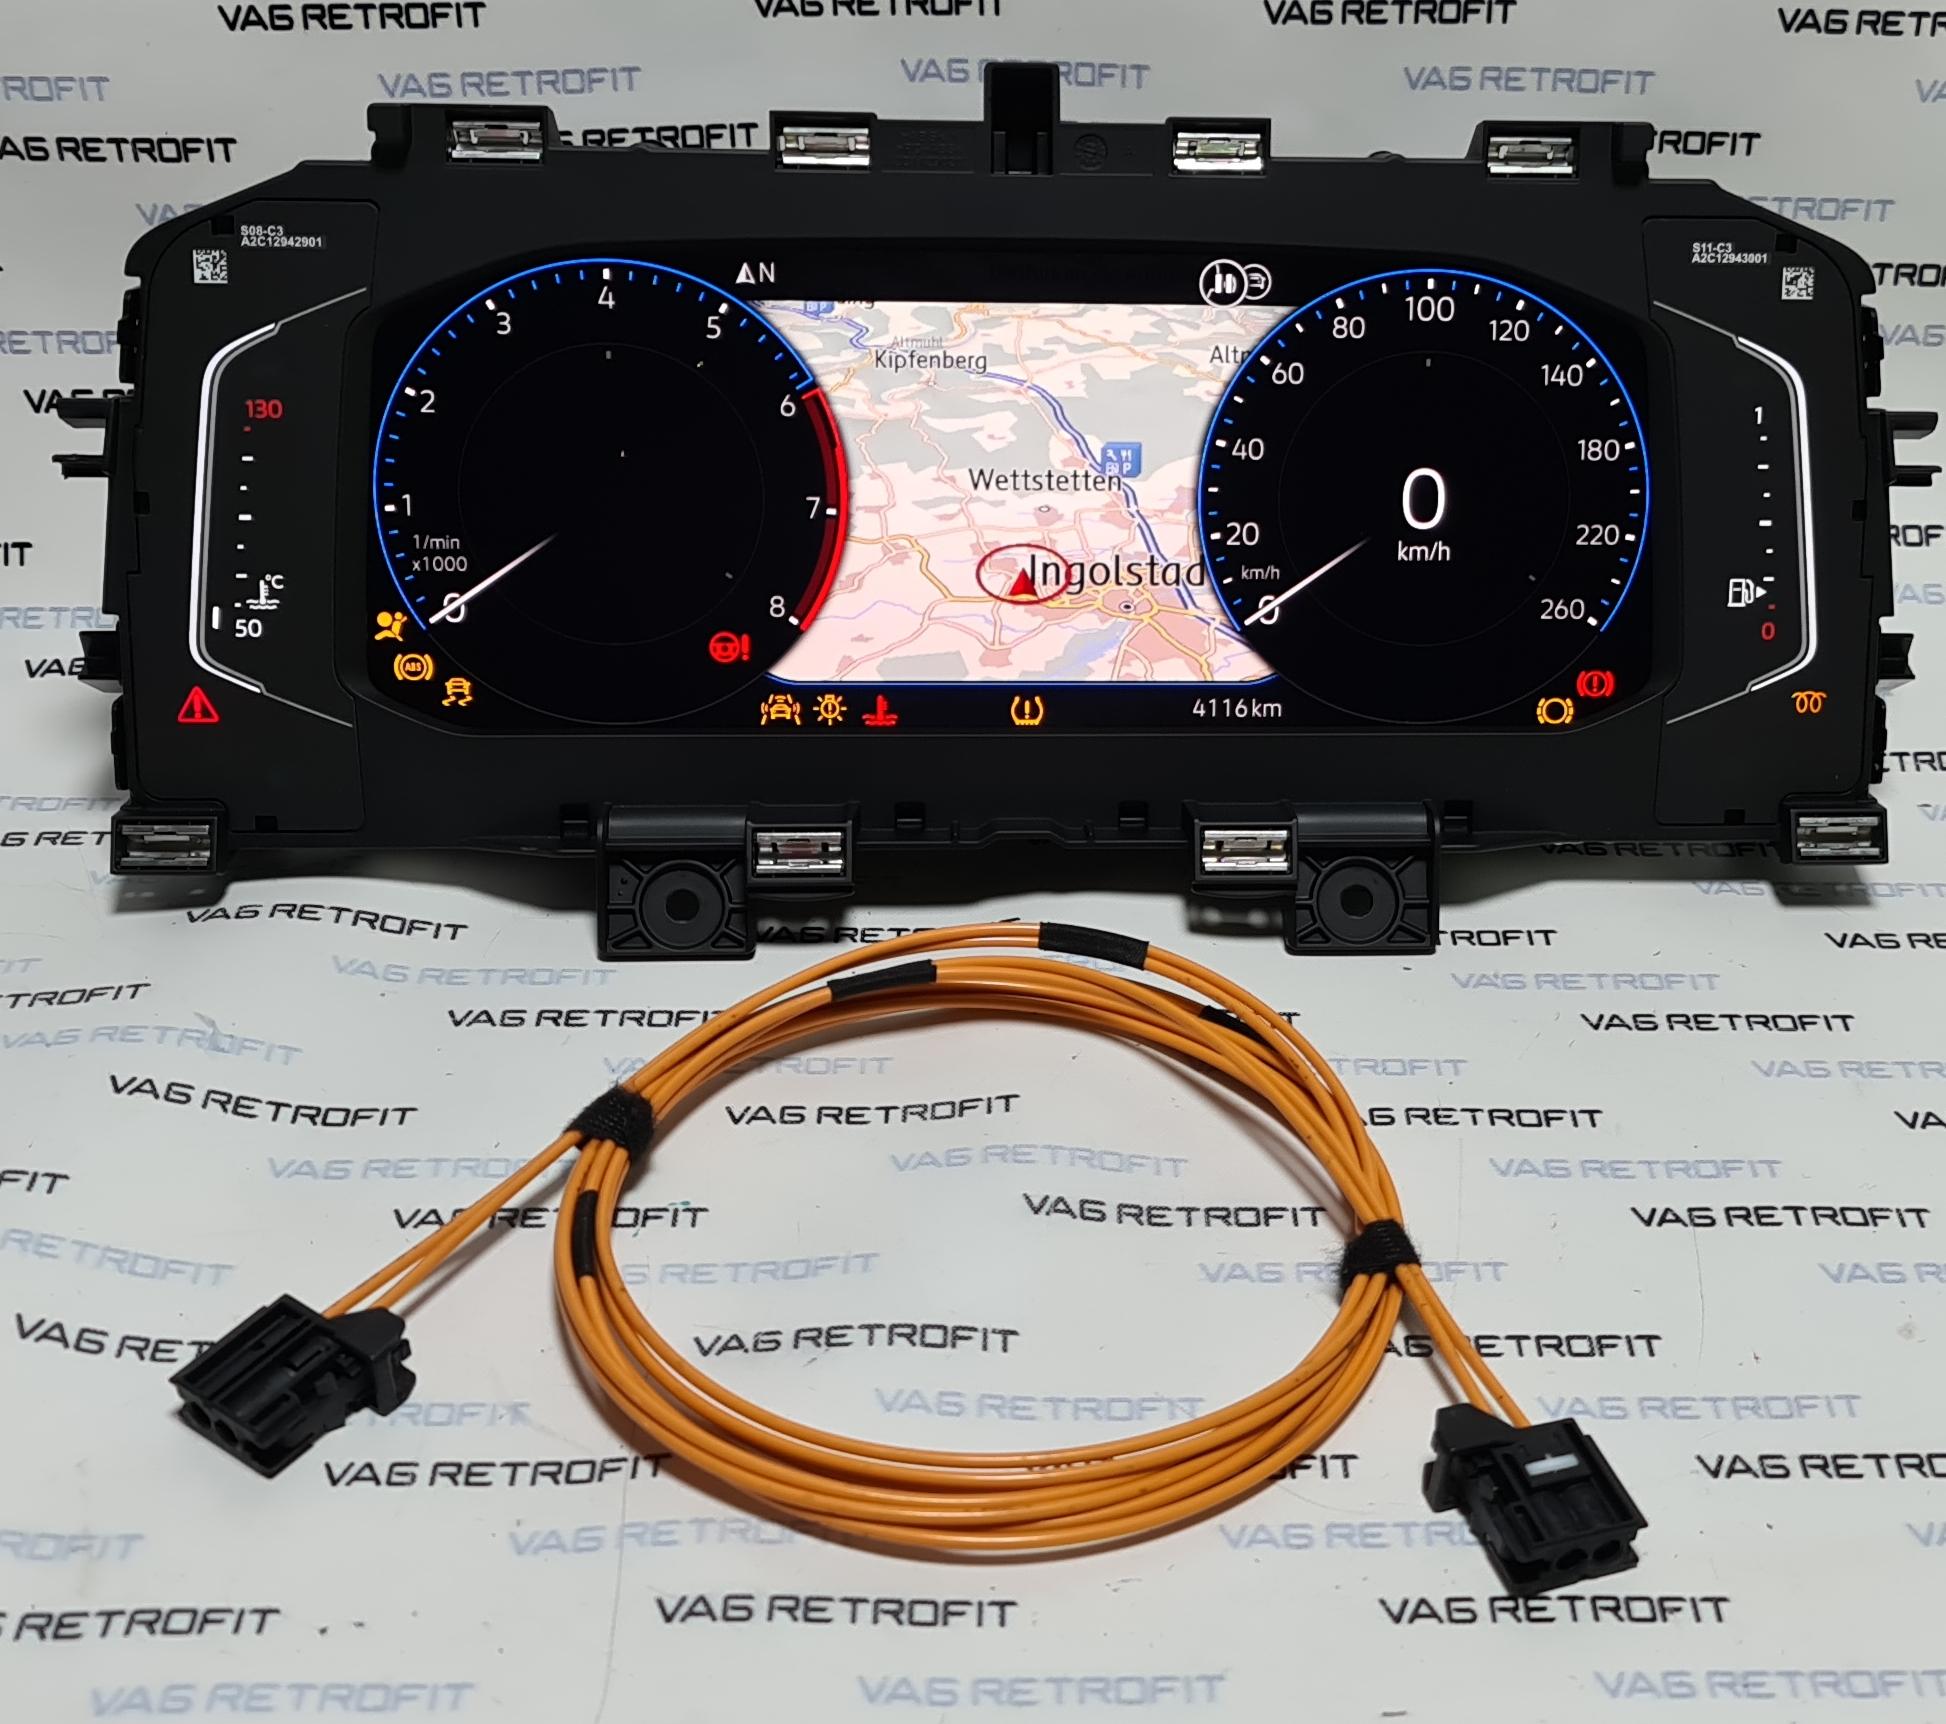 Poza 3 - Ceasuri Bord Digitale VW POLO 2G AW1 GTI T-Cross 2G0920790B / 2G0 920 790 B